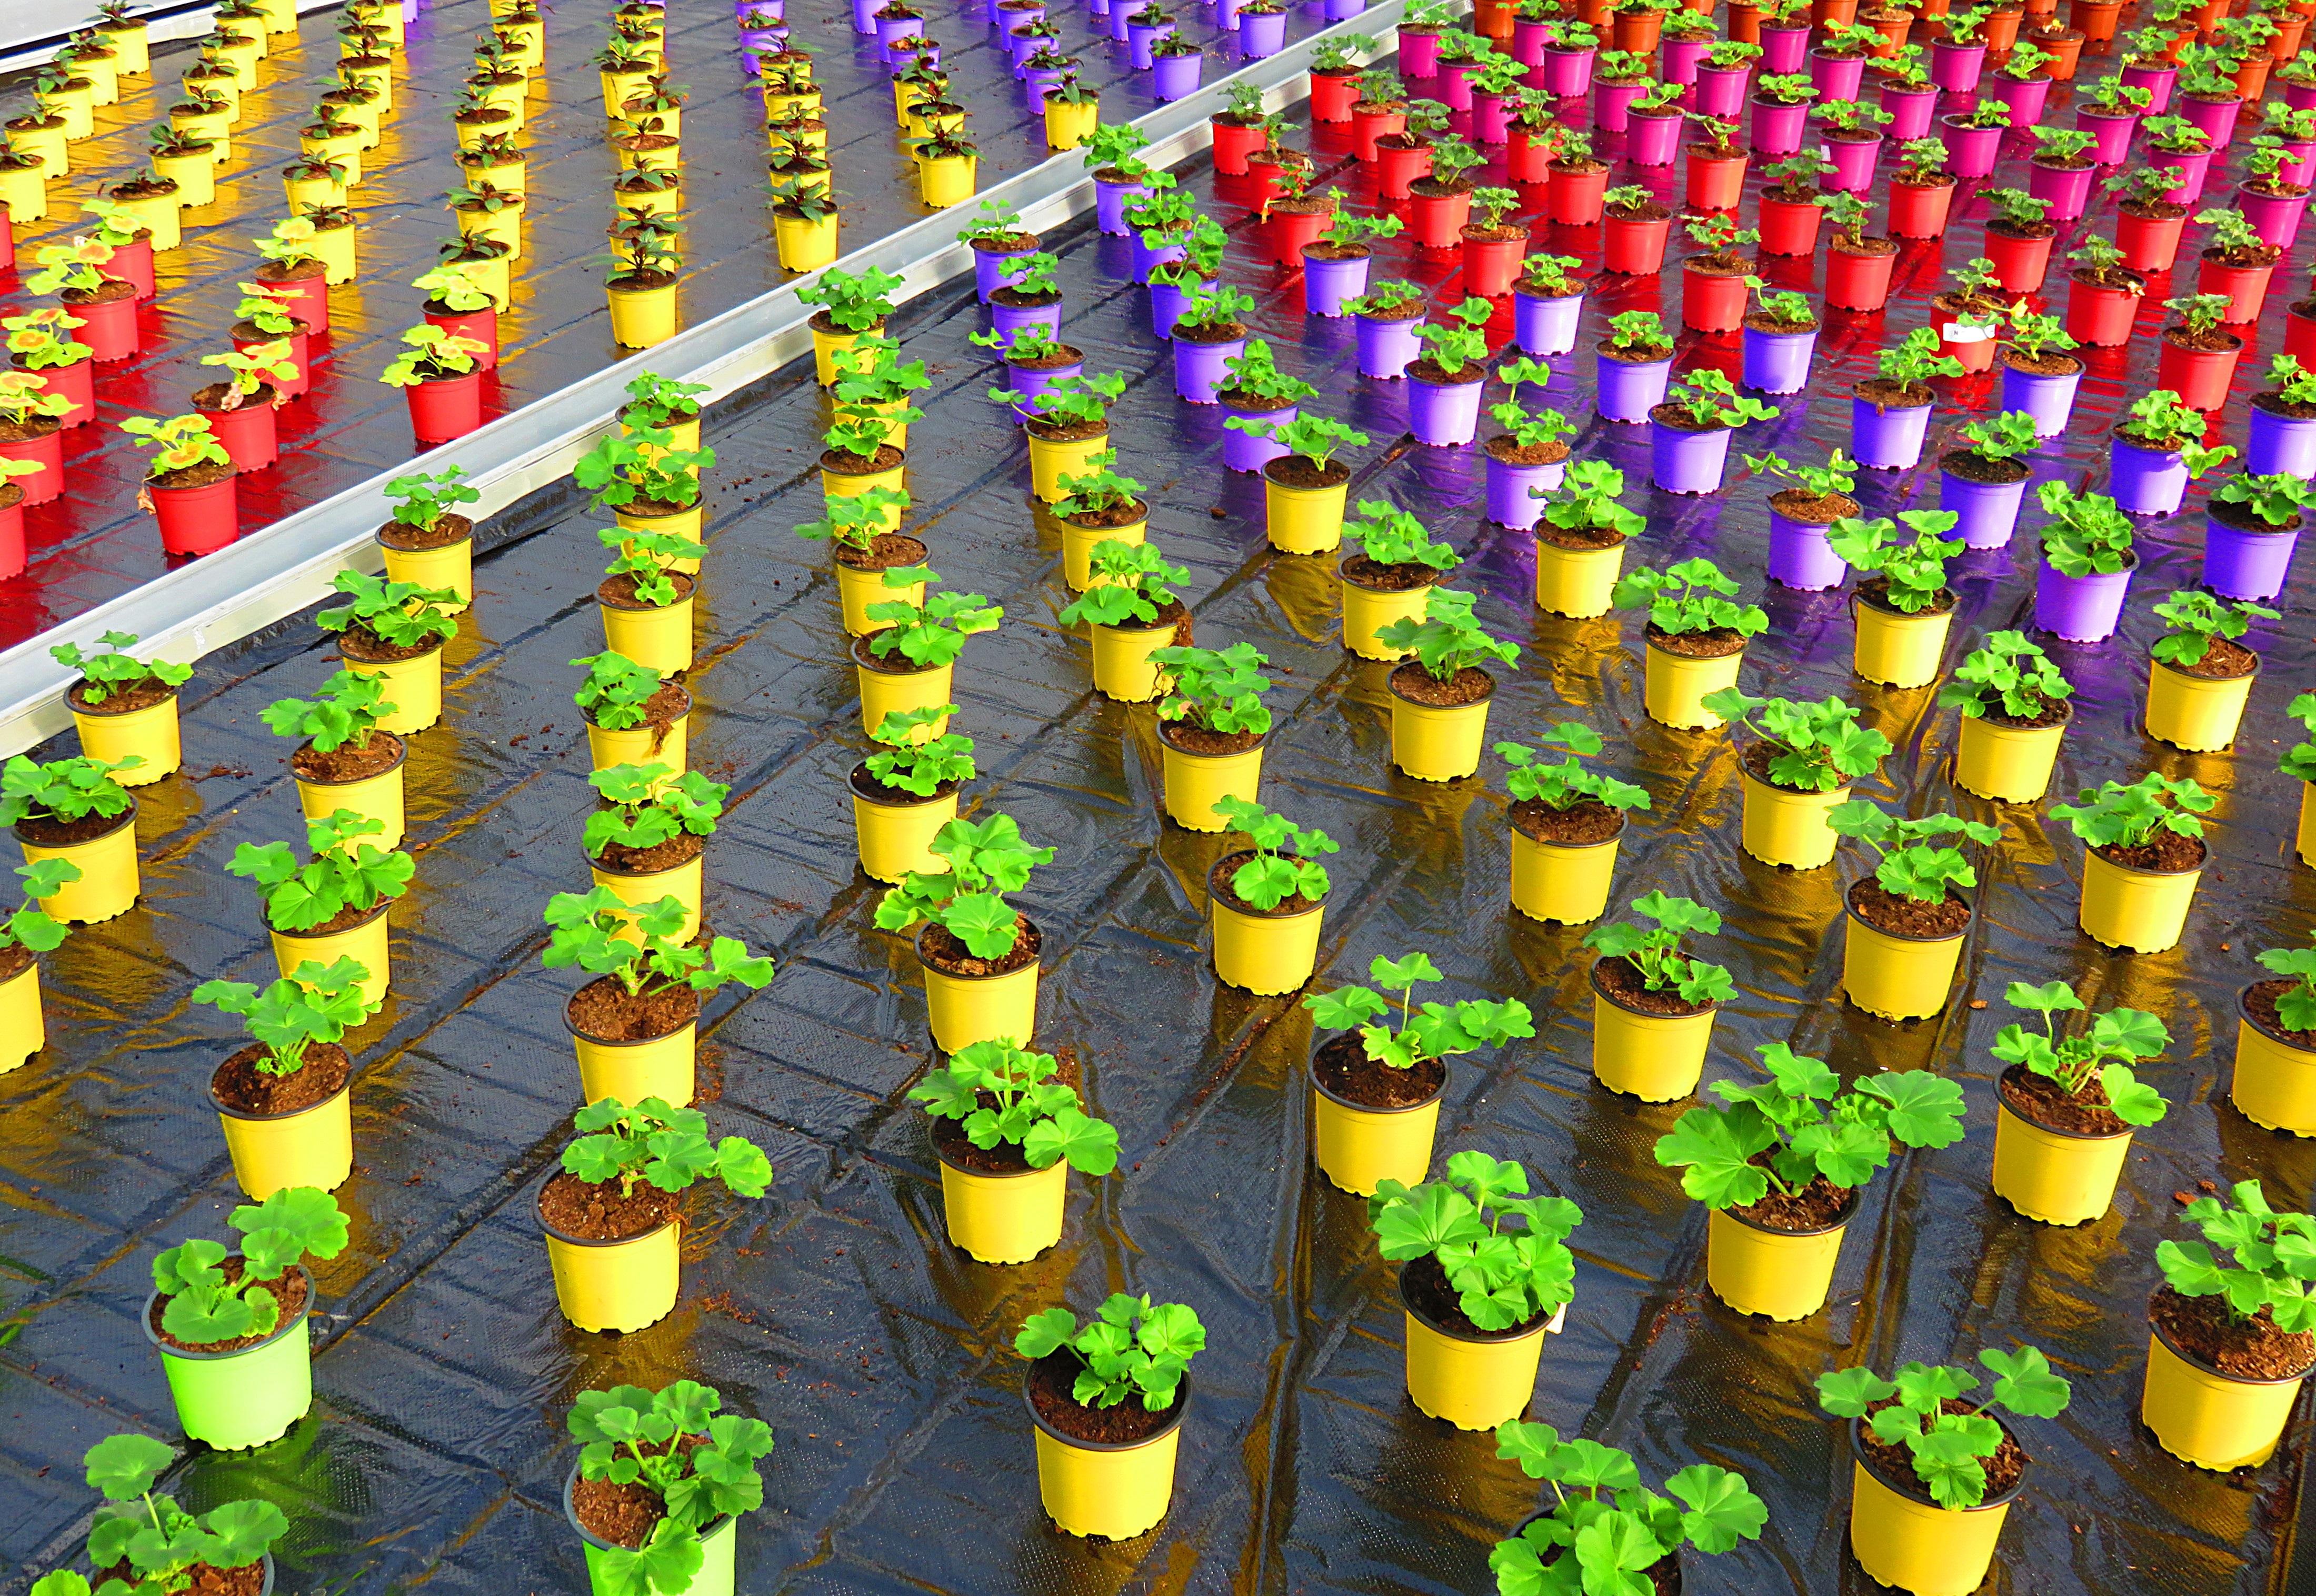 Free Images : flower, pot, green, color, greenhouse, geranium ...